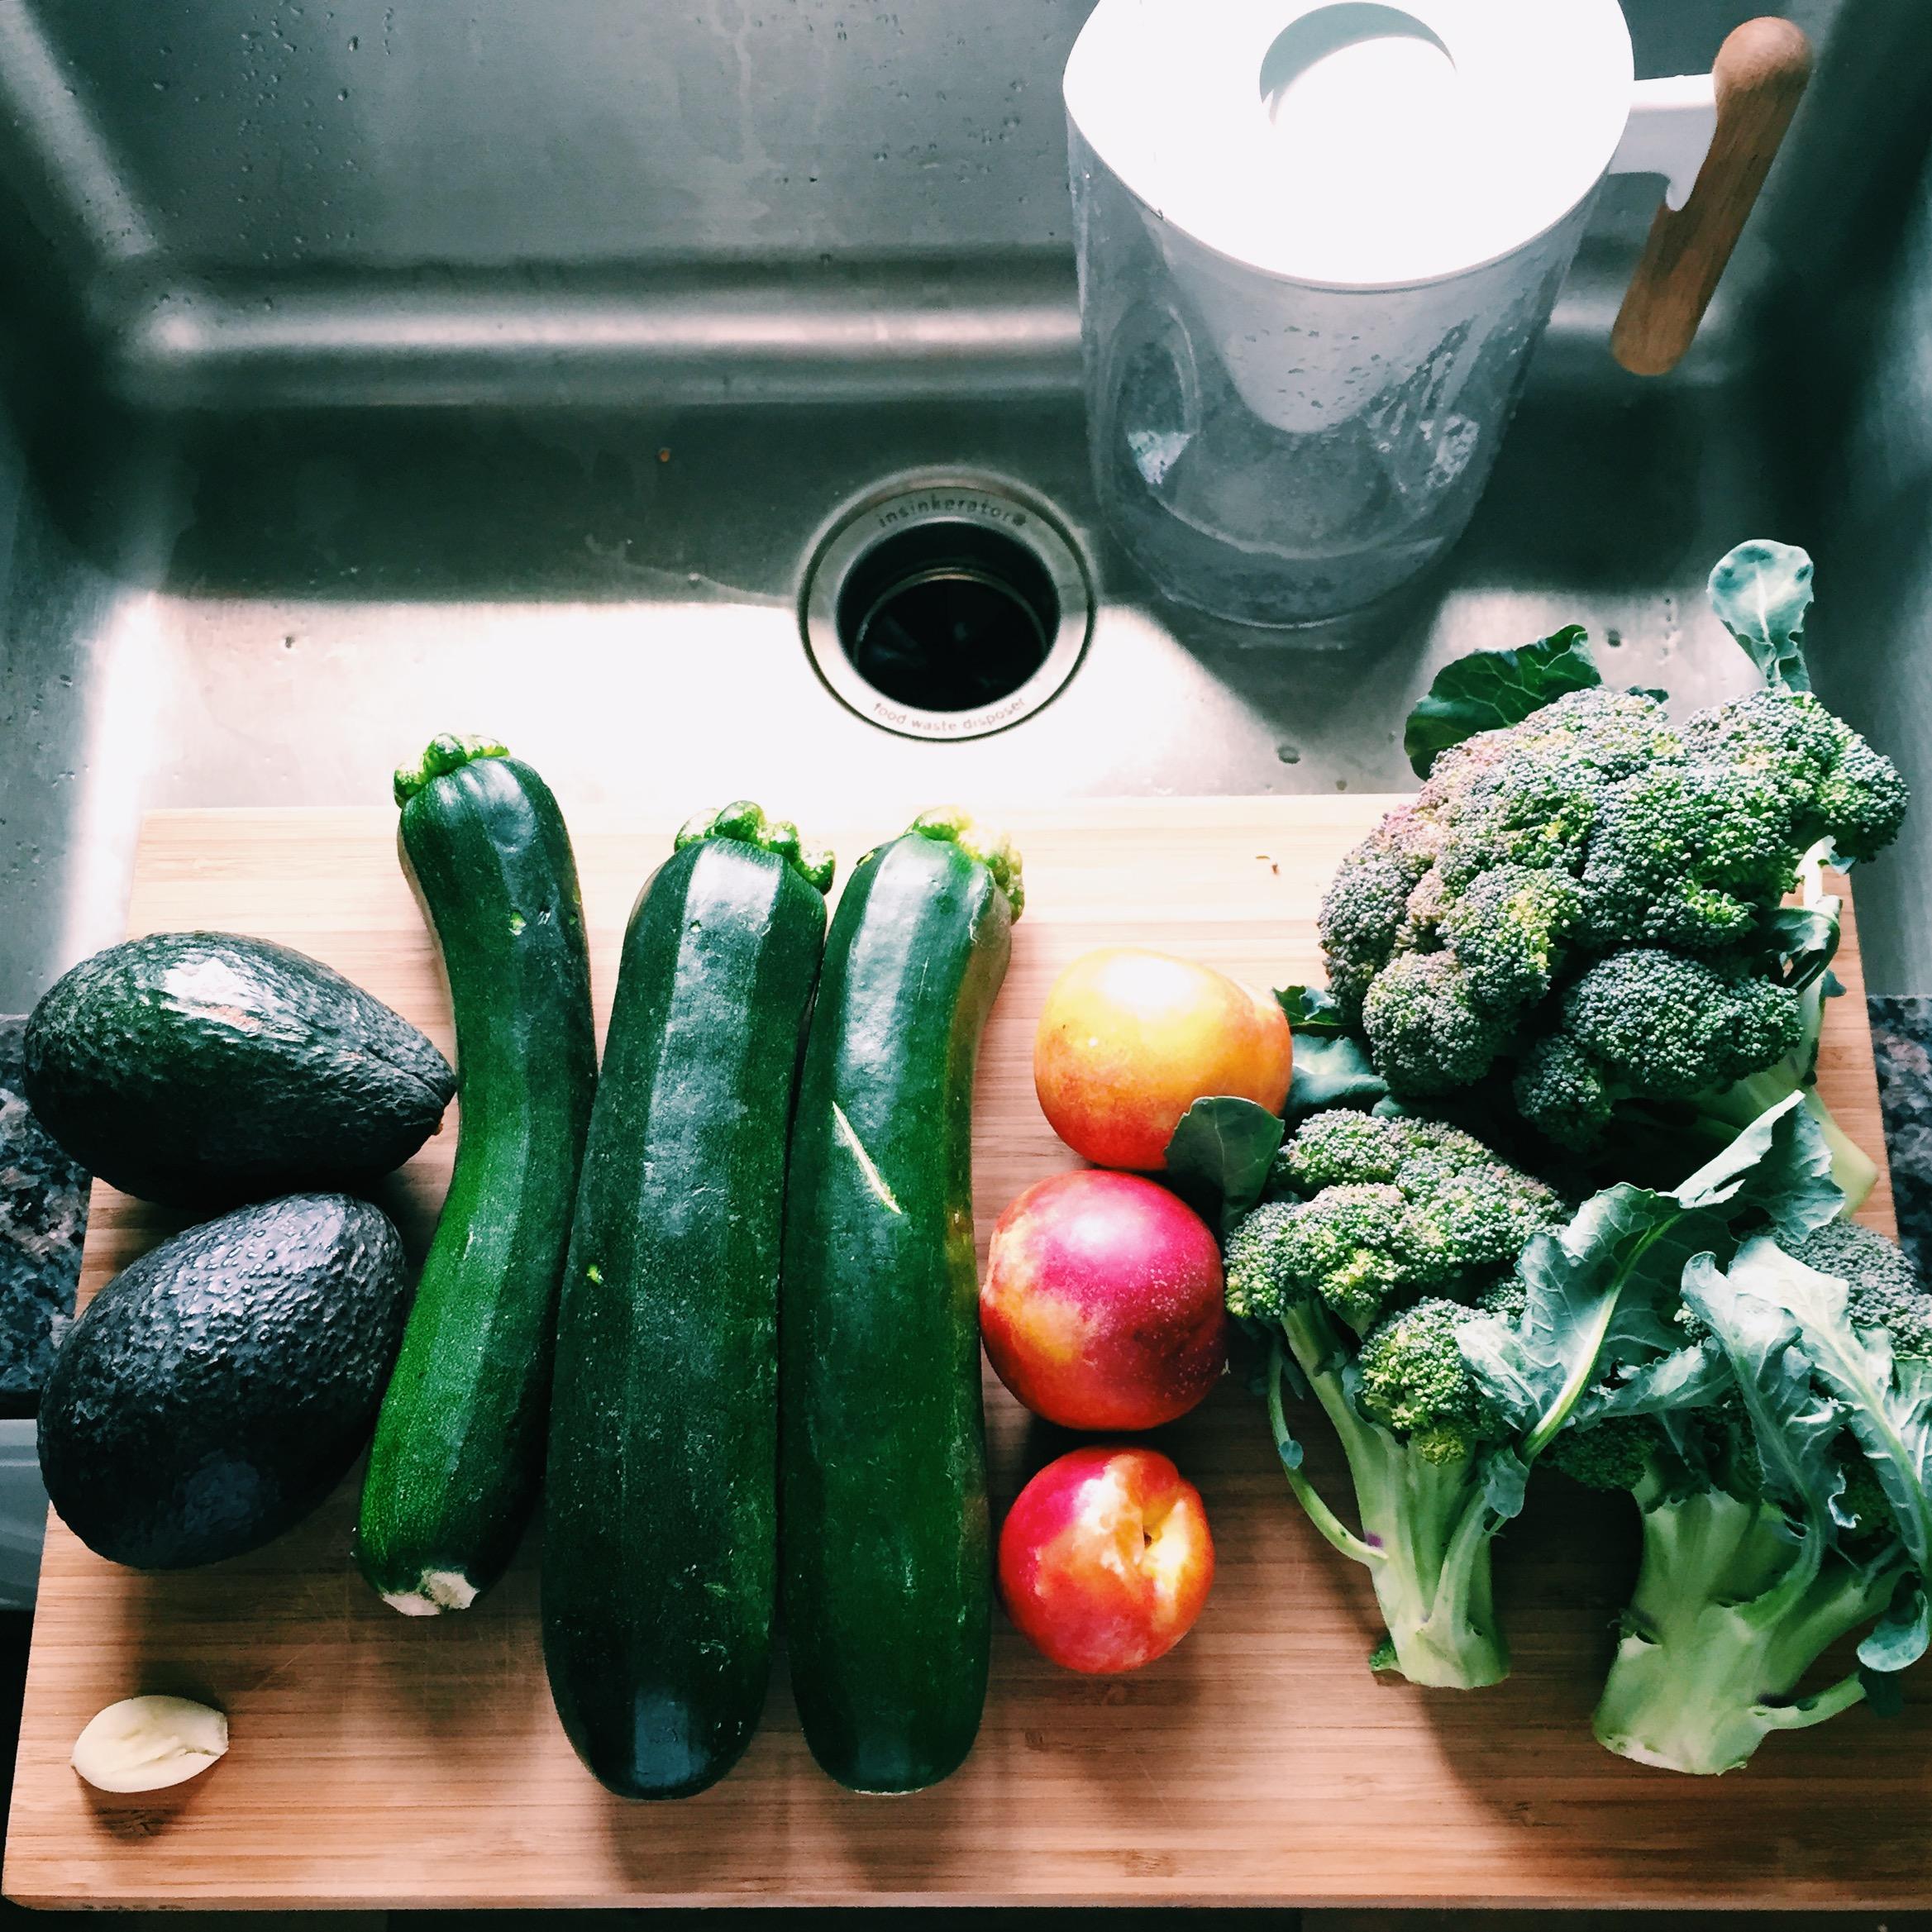 Garlic, Avocado, Zucchini, Yellow Nectarines, Broccoli, all 100% Organic (not pictured: eggs!)